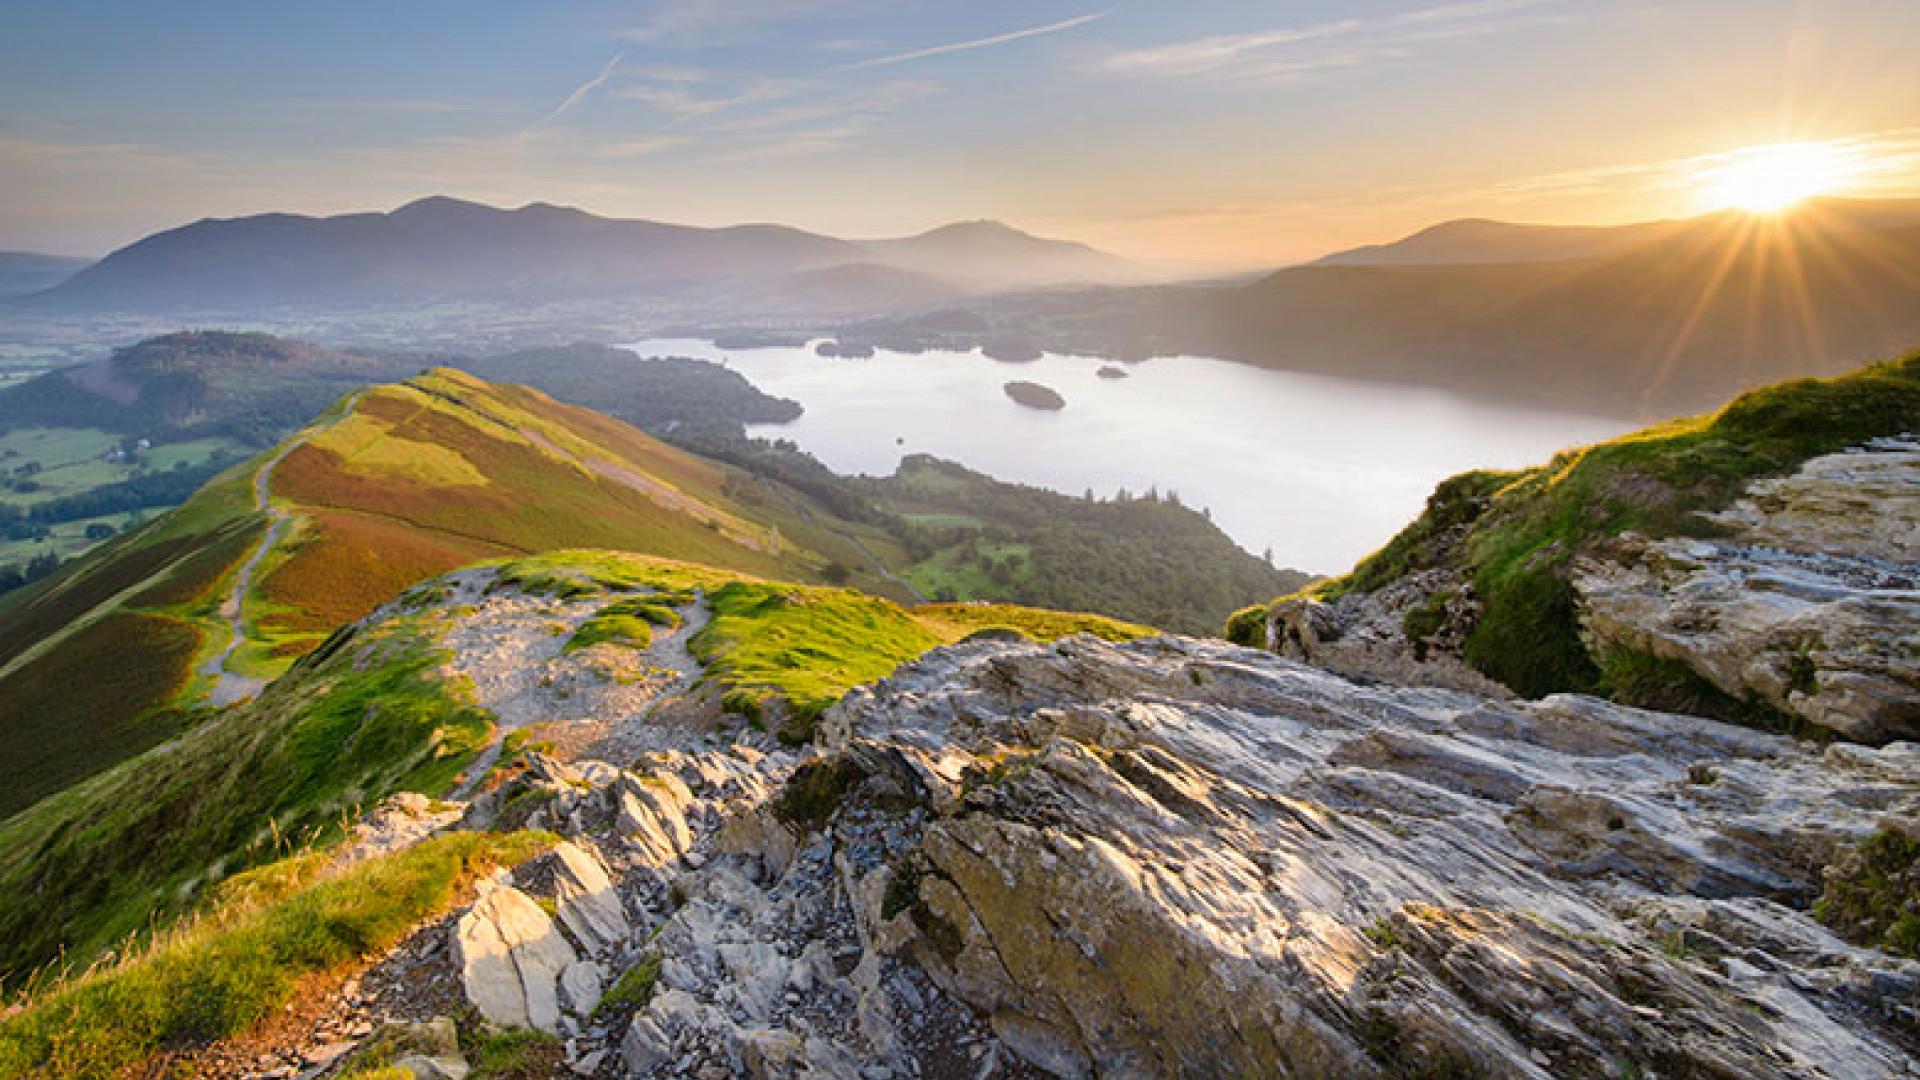 Catbells-Sunrise,-Cumbria,-by-Bart-Heirweg,-(Take-a-view,-2013)